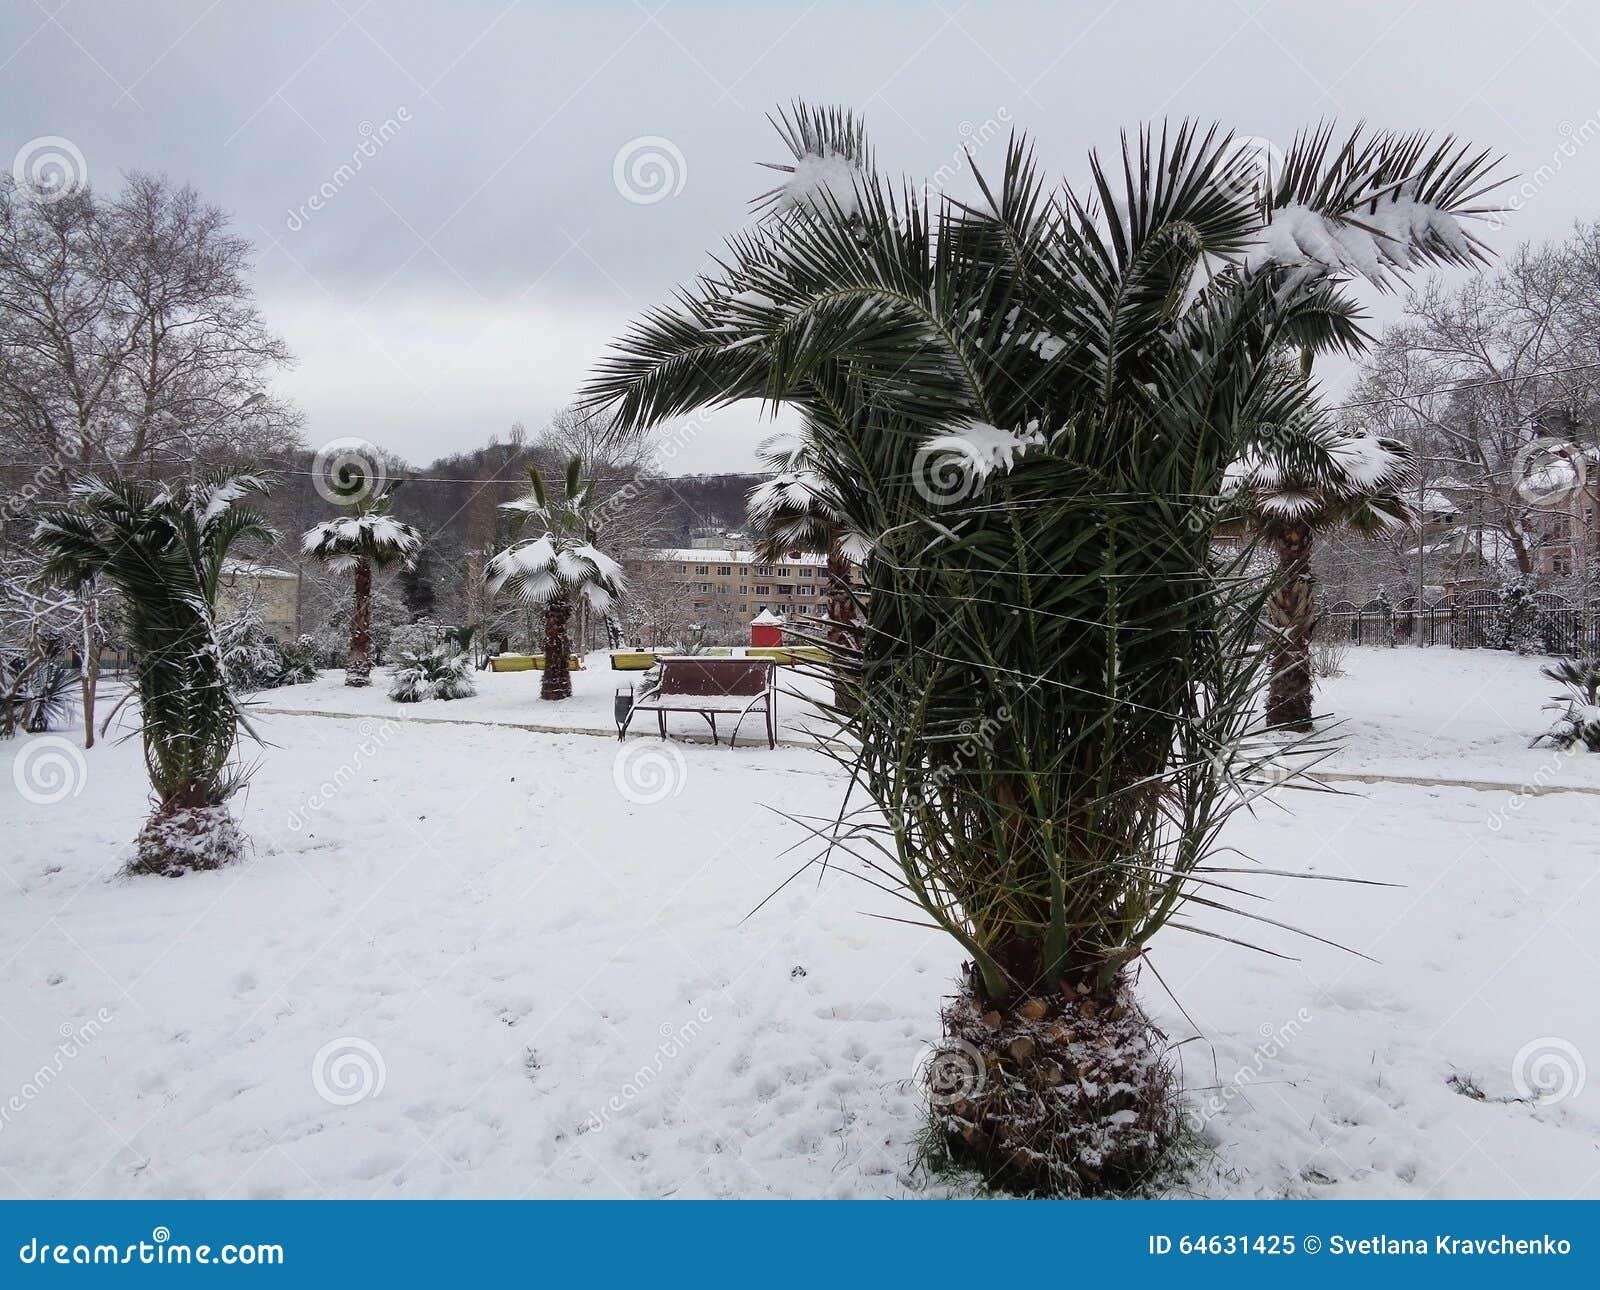 Drzewka palmowe w śniegu, Sochi, Rosja